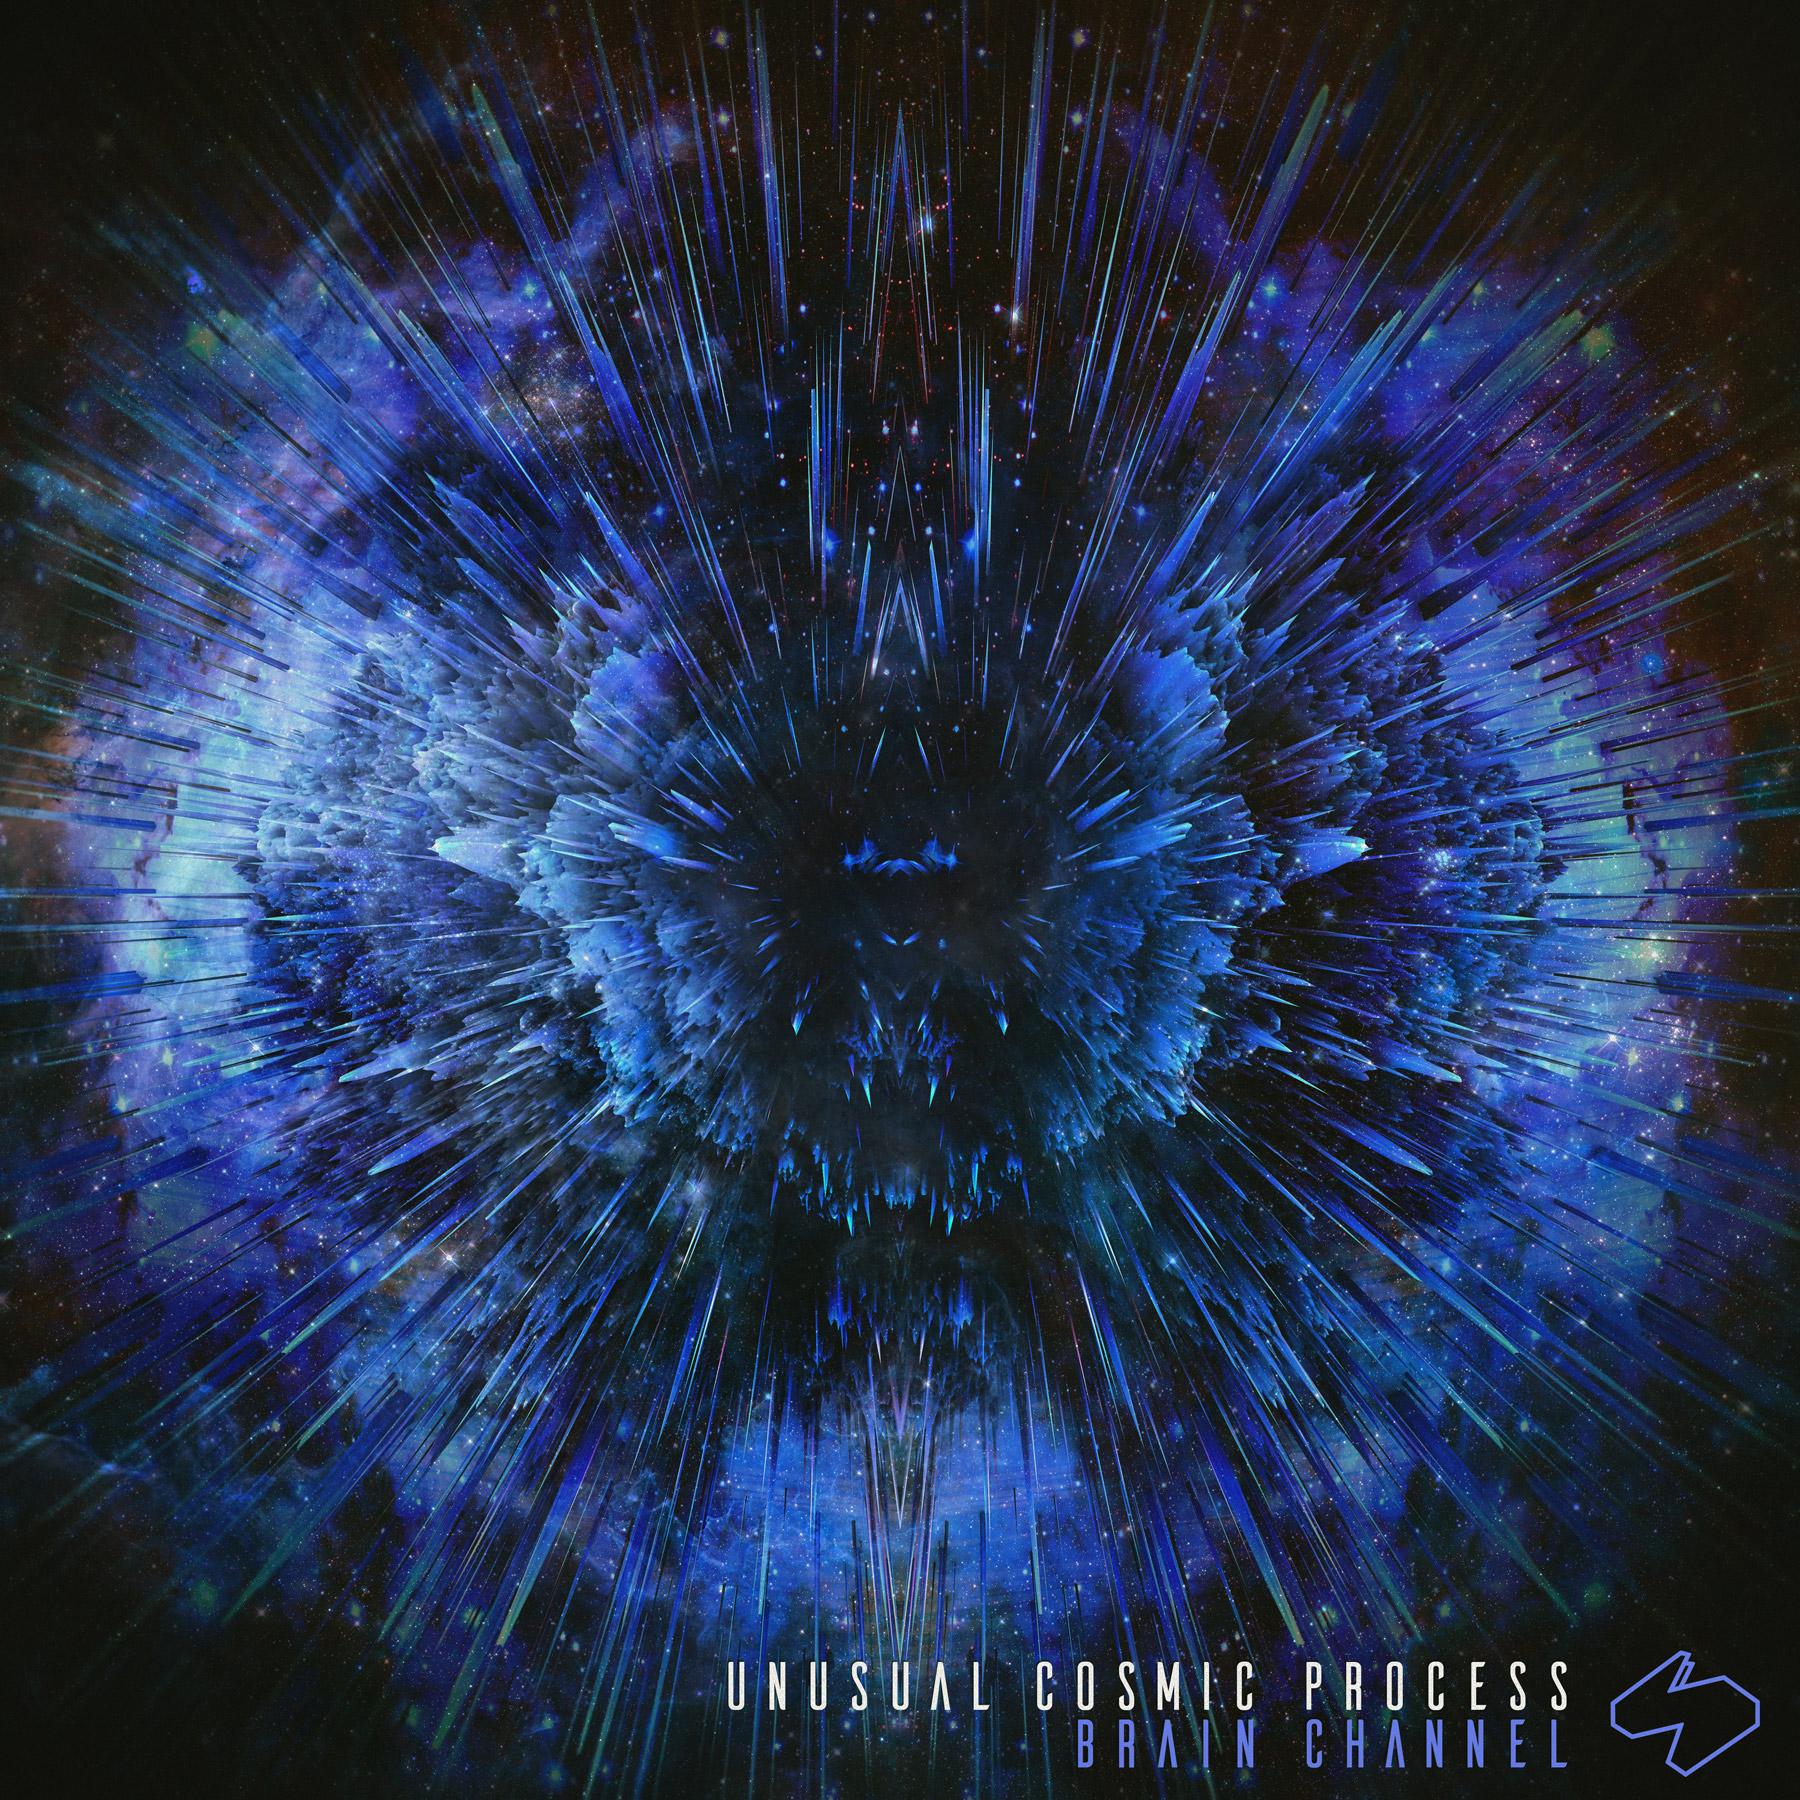 Unusual Cosmic Process «Brain Channel» EP